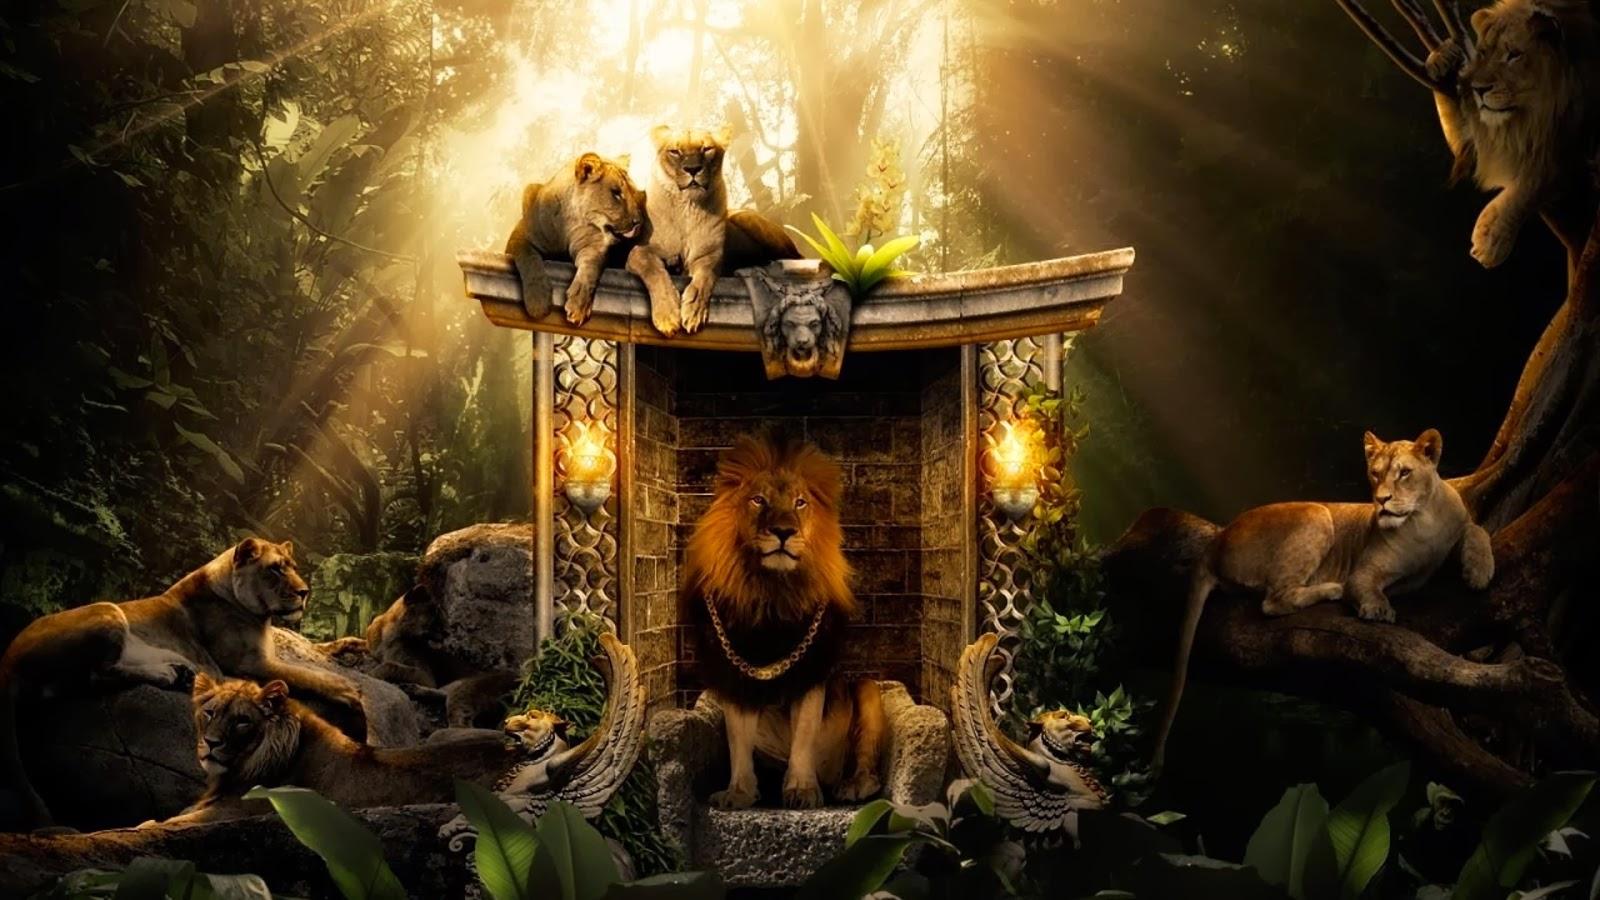 Jungle Lions